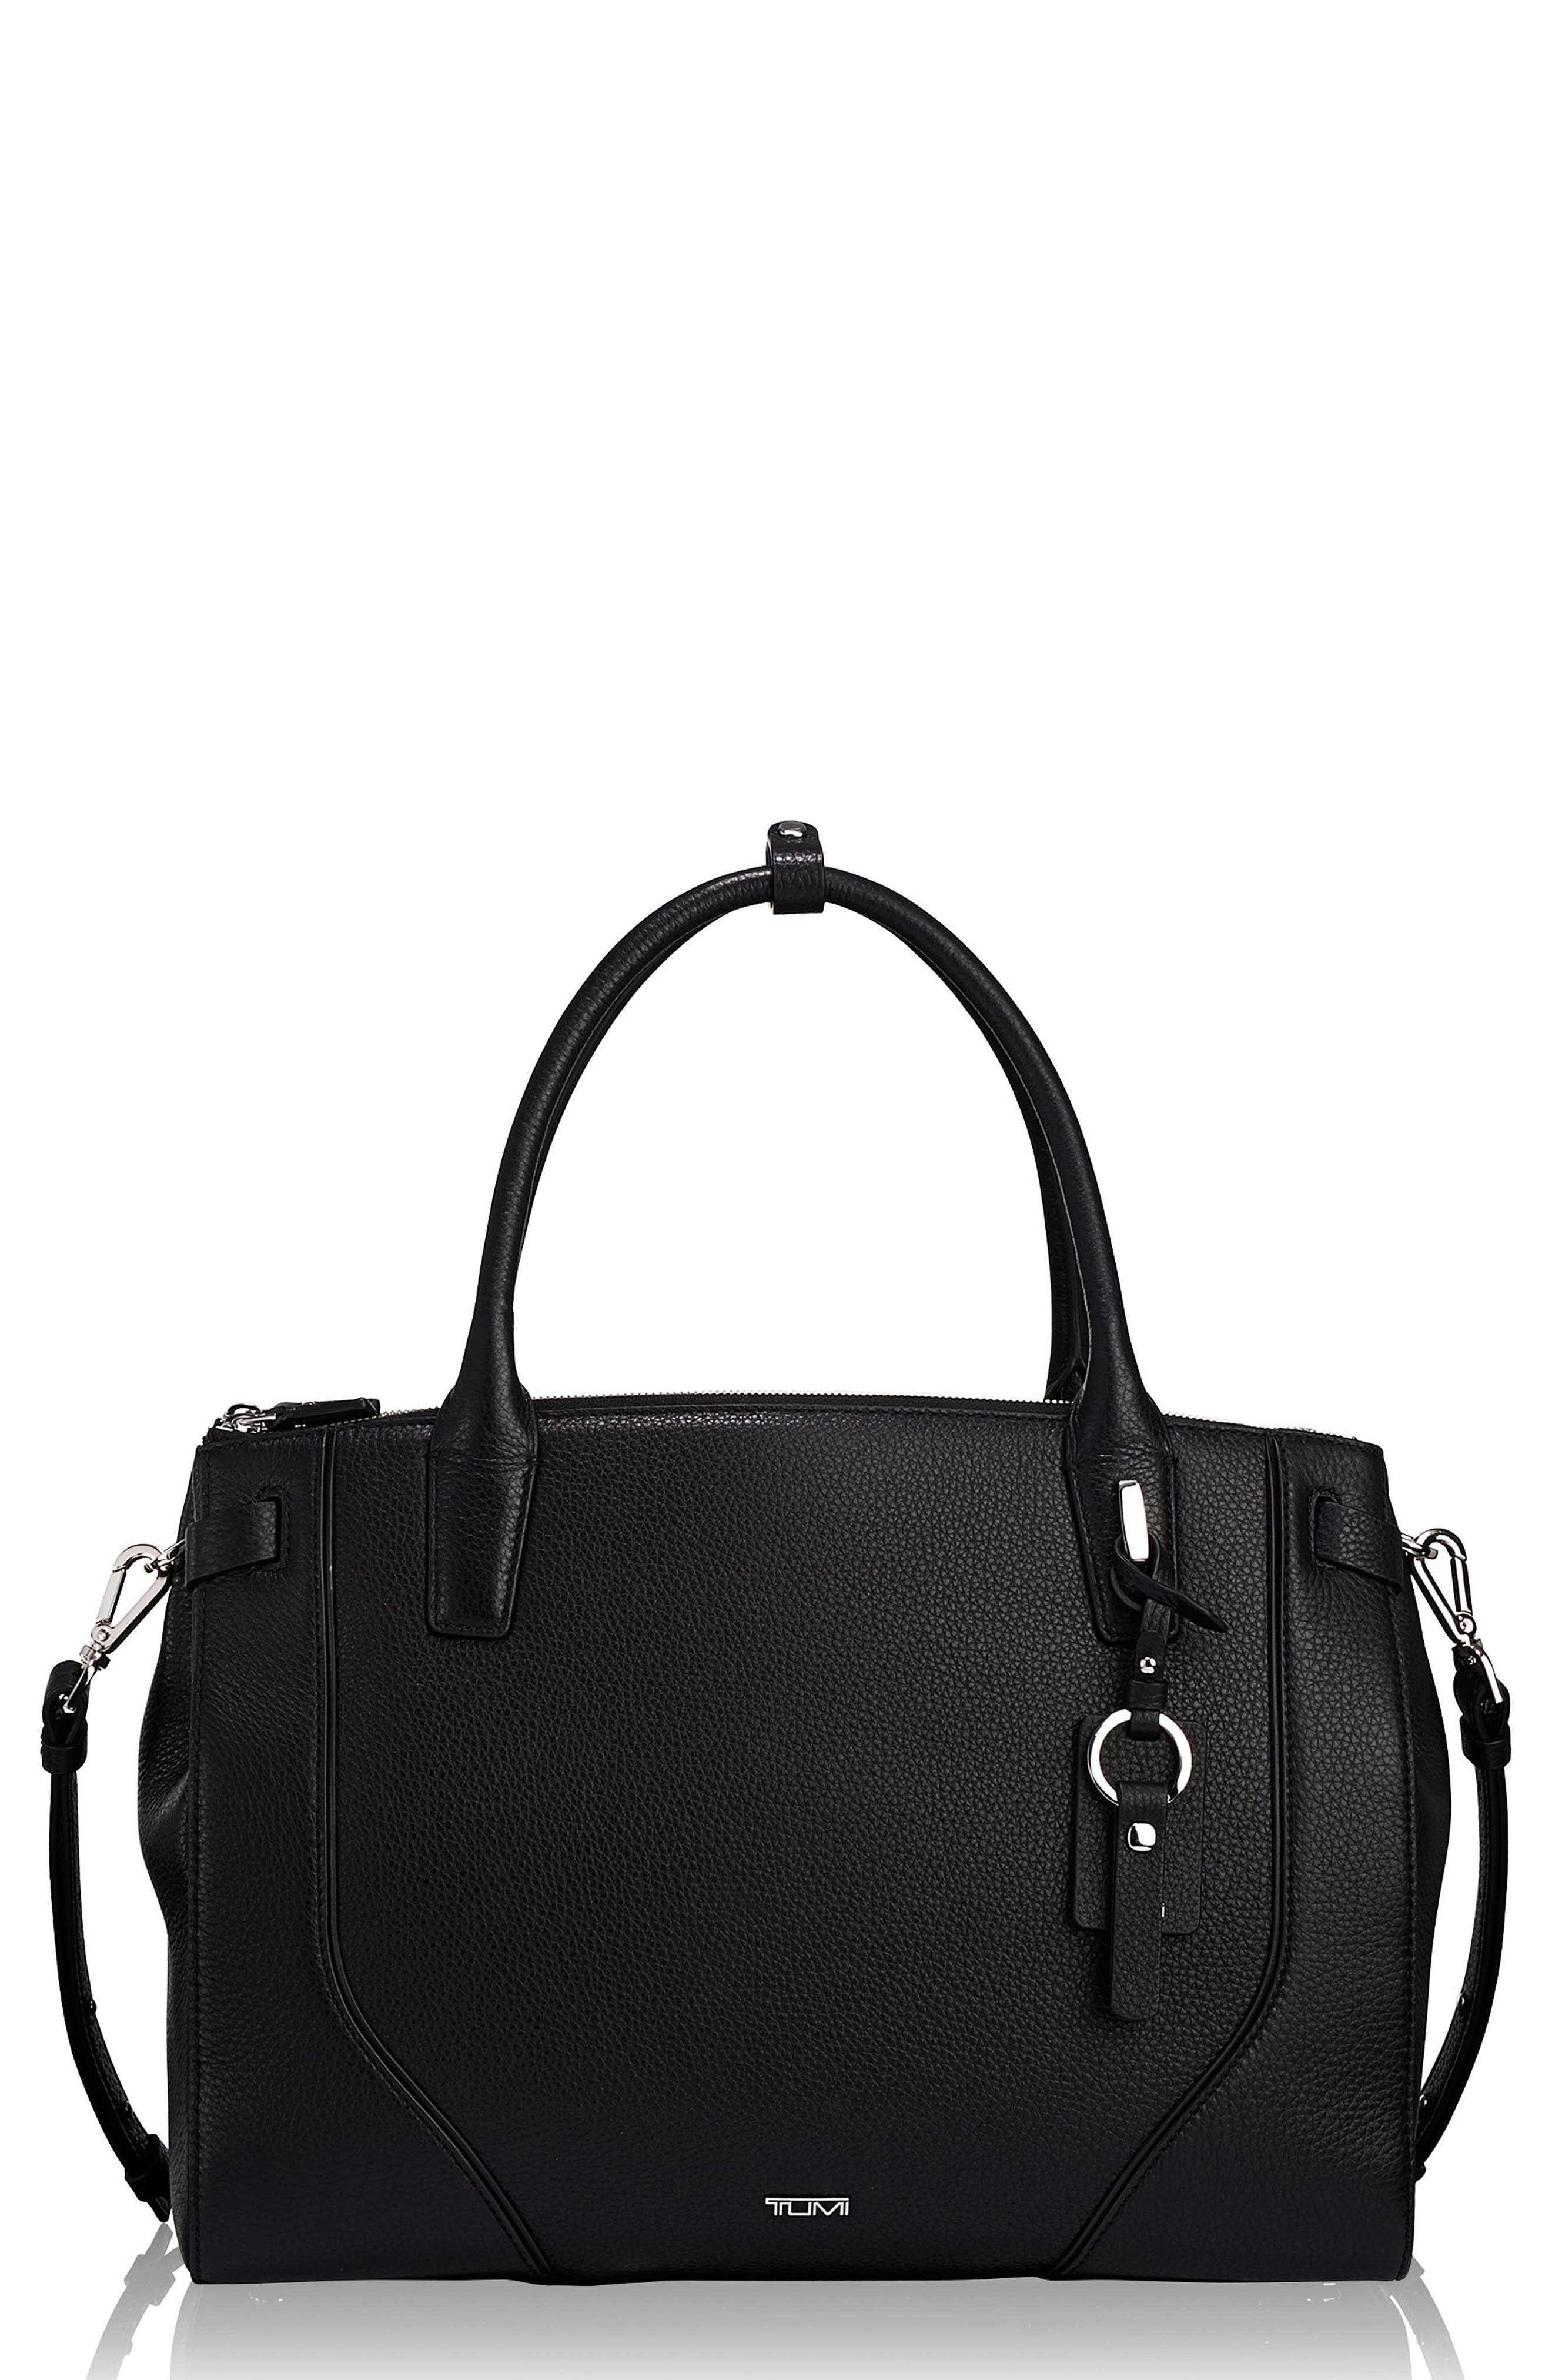 TUMI, Stanton Kiran Leather Laptop Briefcase, Main thumbnail 1, color, BLACK